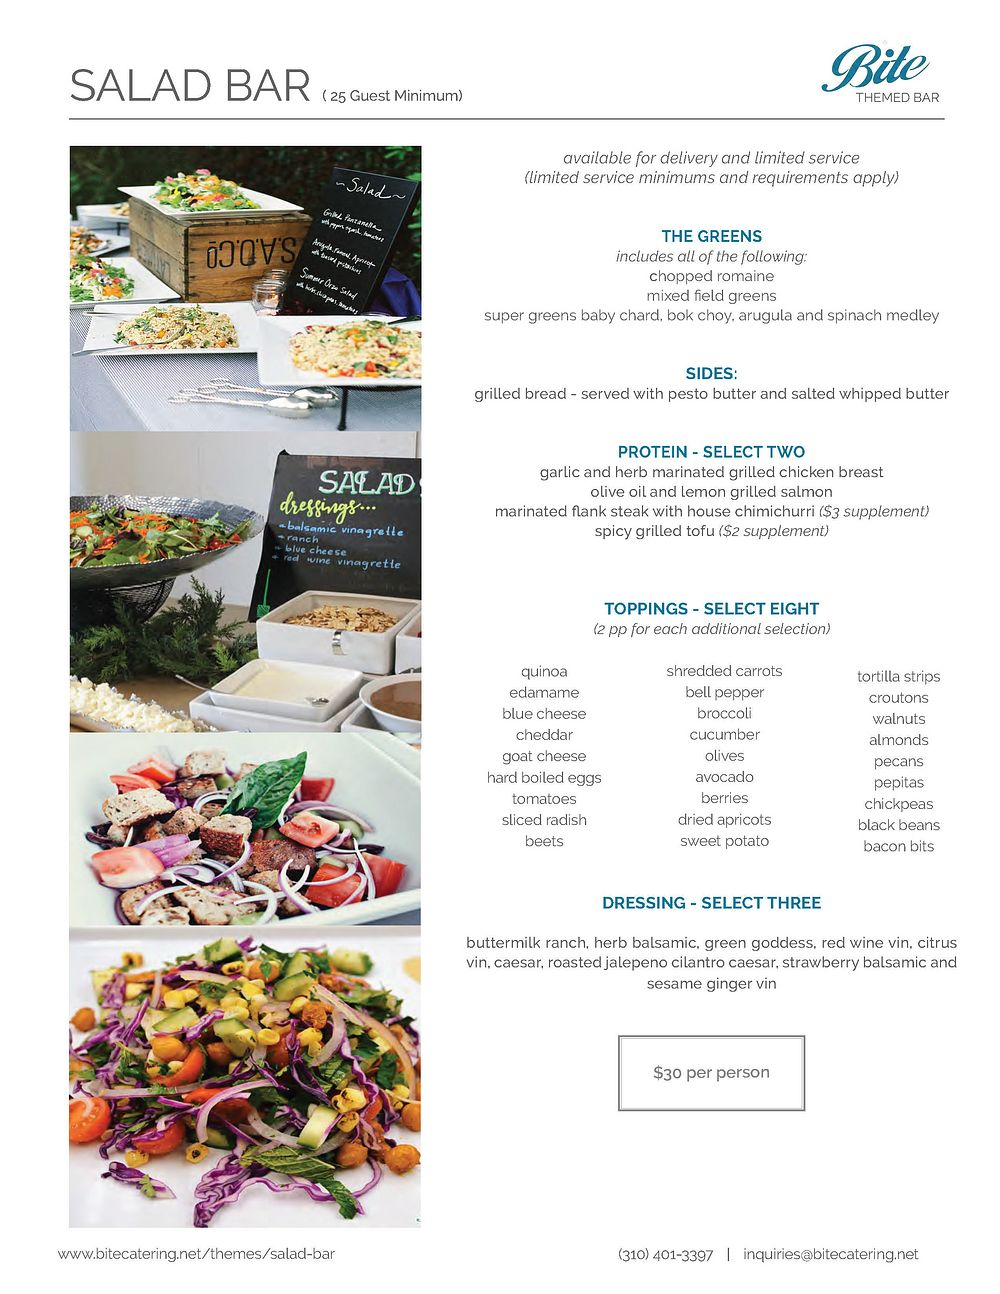 Entree Salad Bar